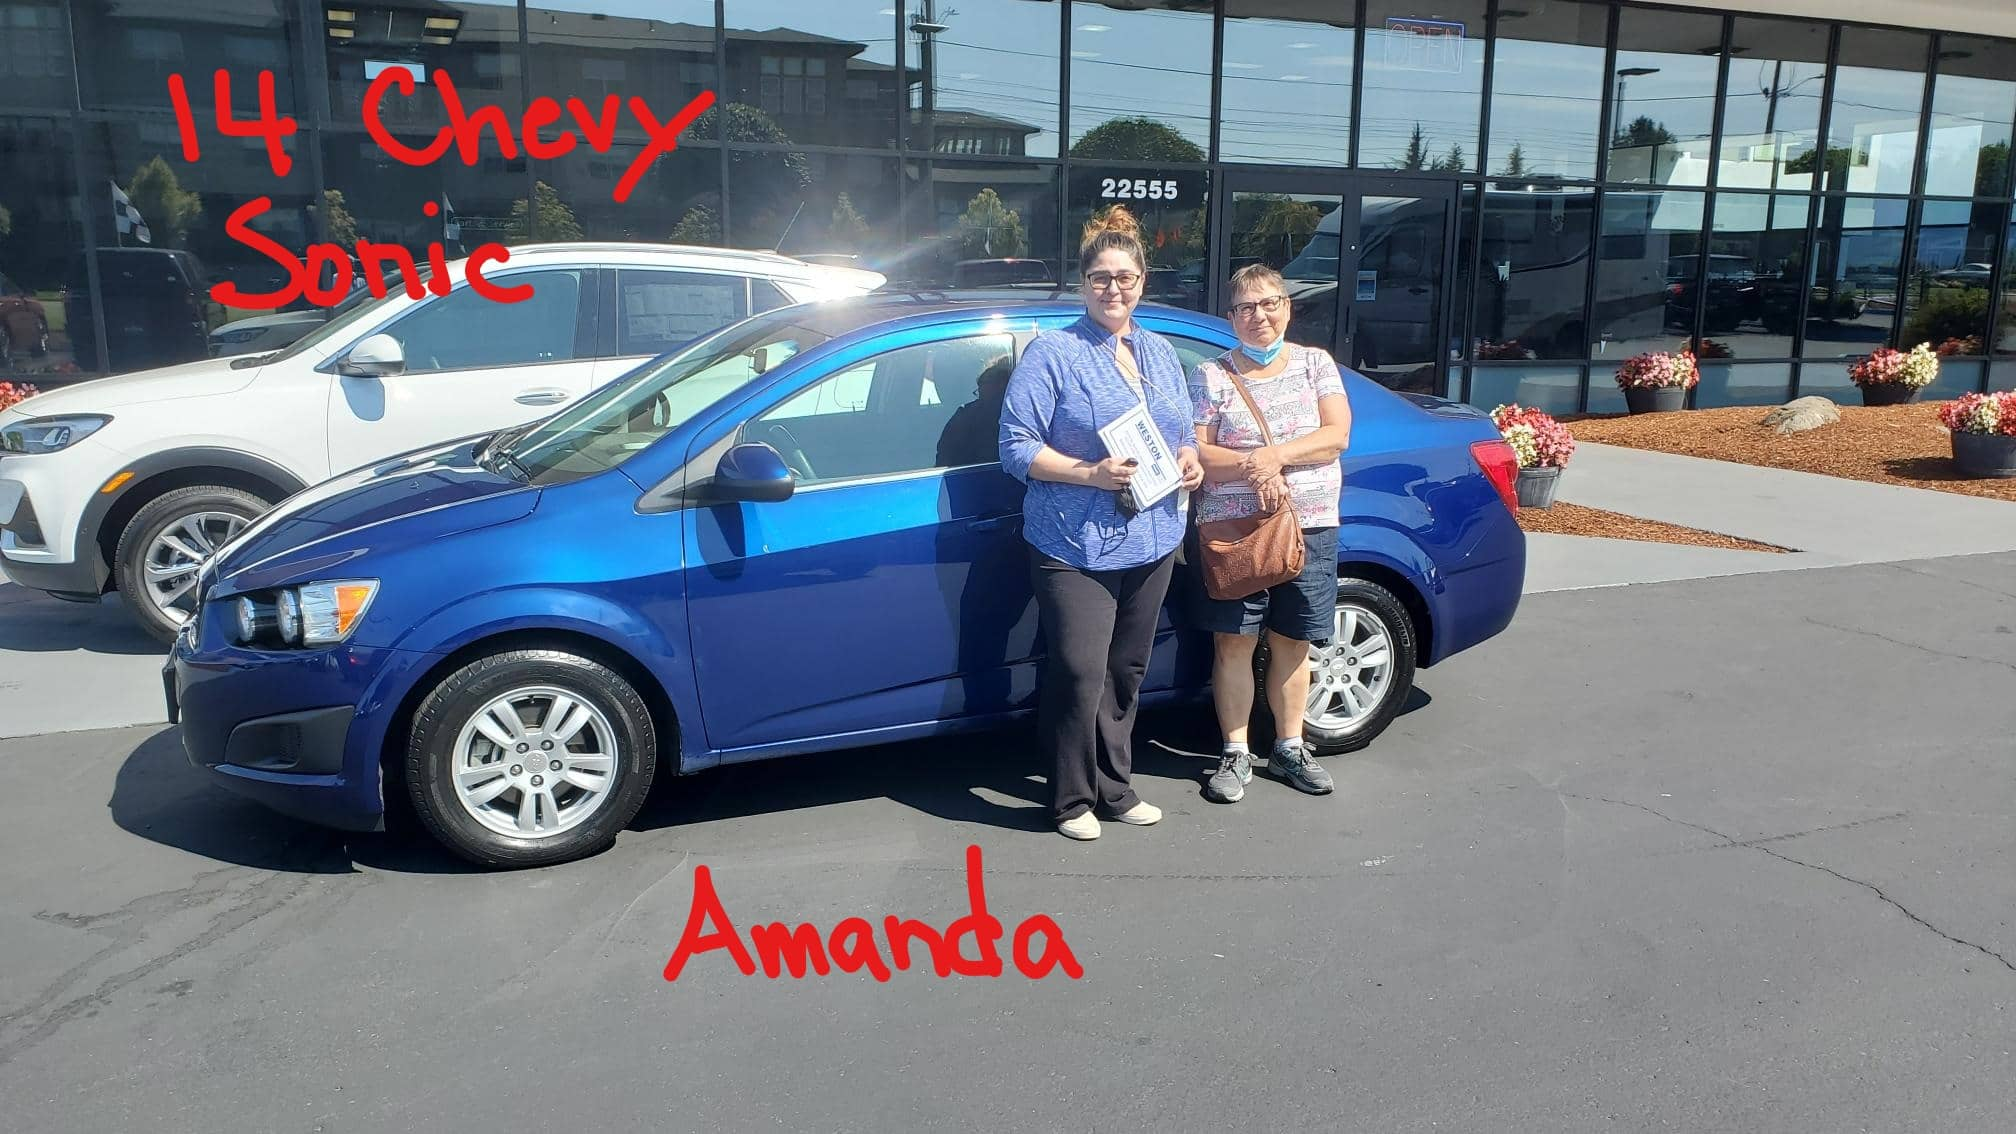 14 Chevy Sonic Amanda